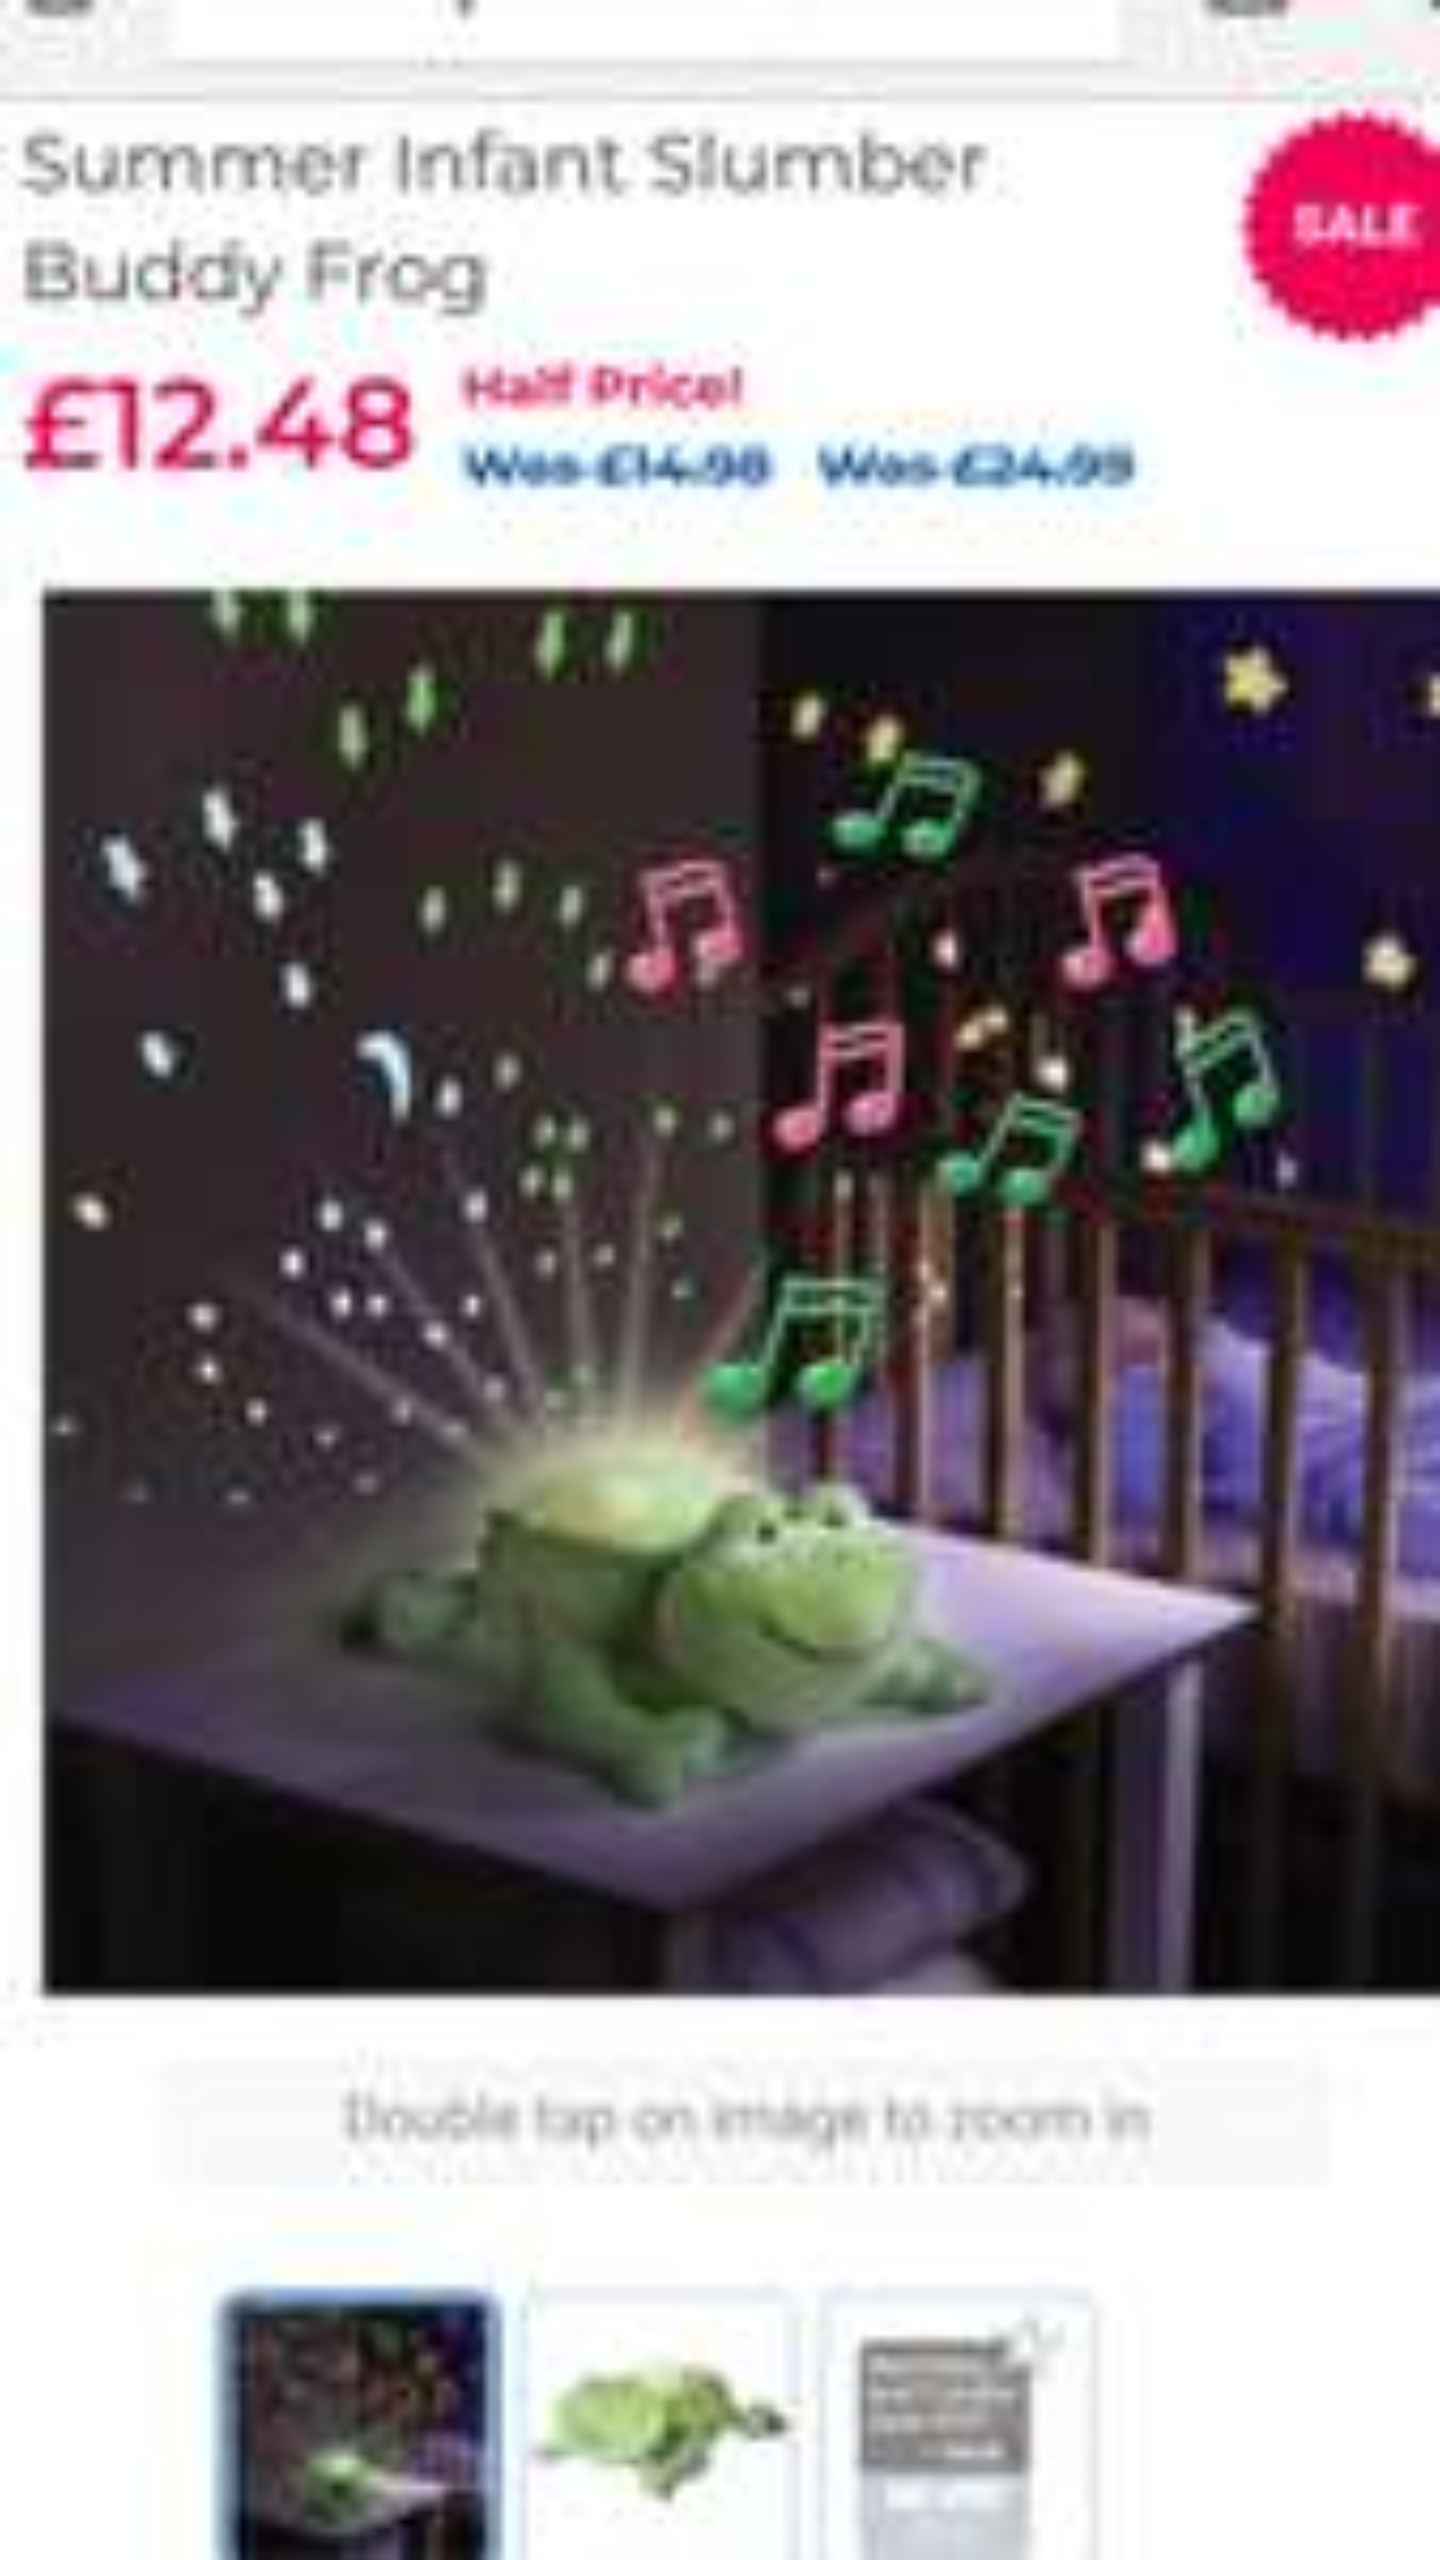 Summer Infant Slumber Buddy Frog 12.48 from £24.99 babiesrus C&C